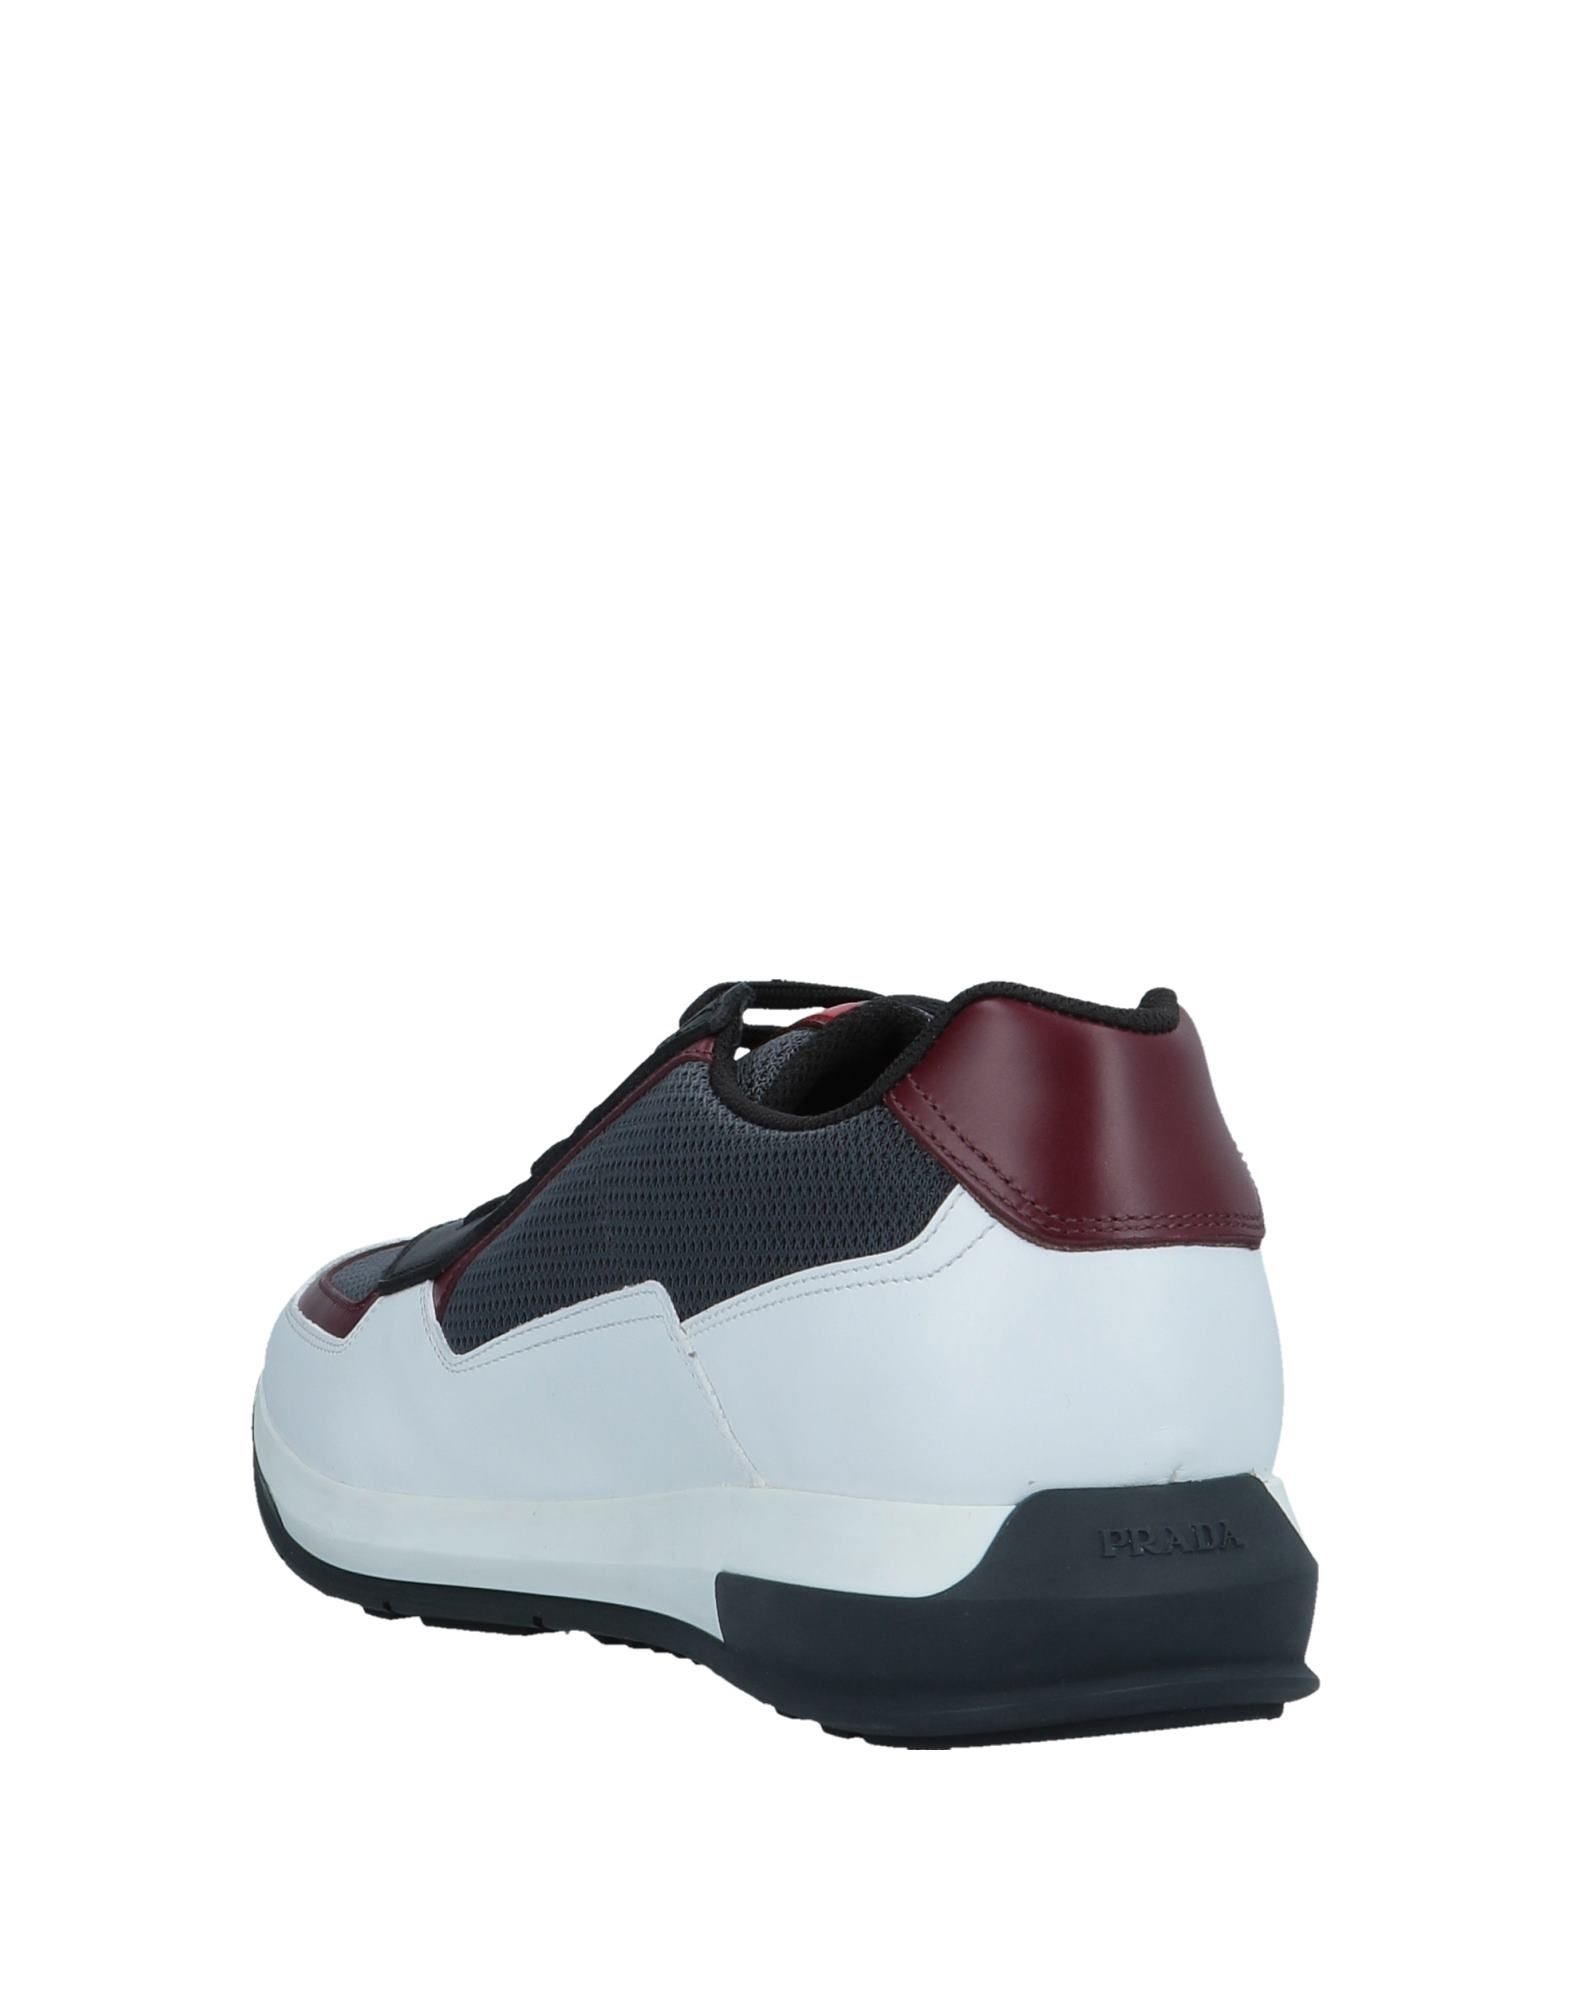 Prada Sport Sneakers Herren  11560012WH Gute Qualität beliebte Schuhe